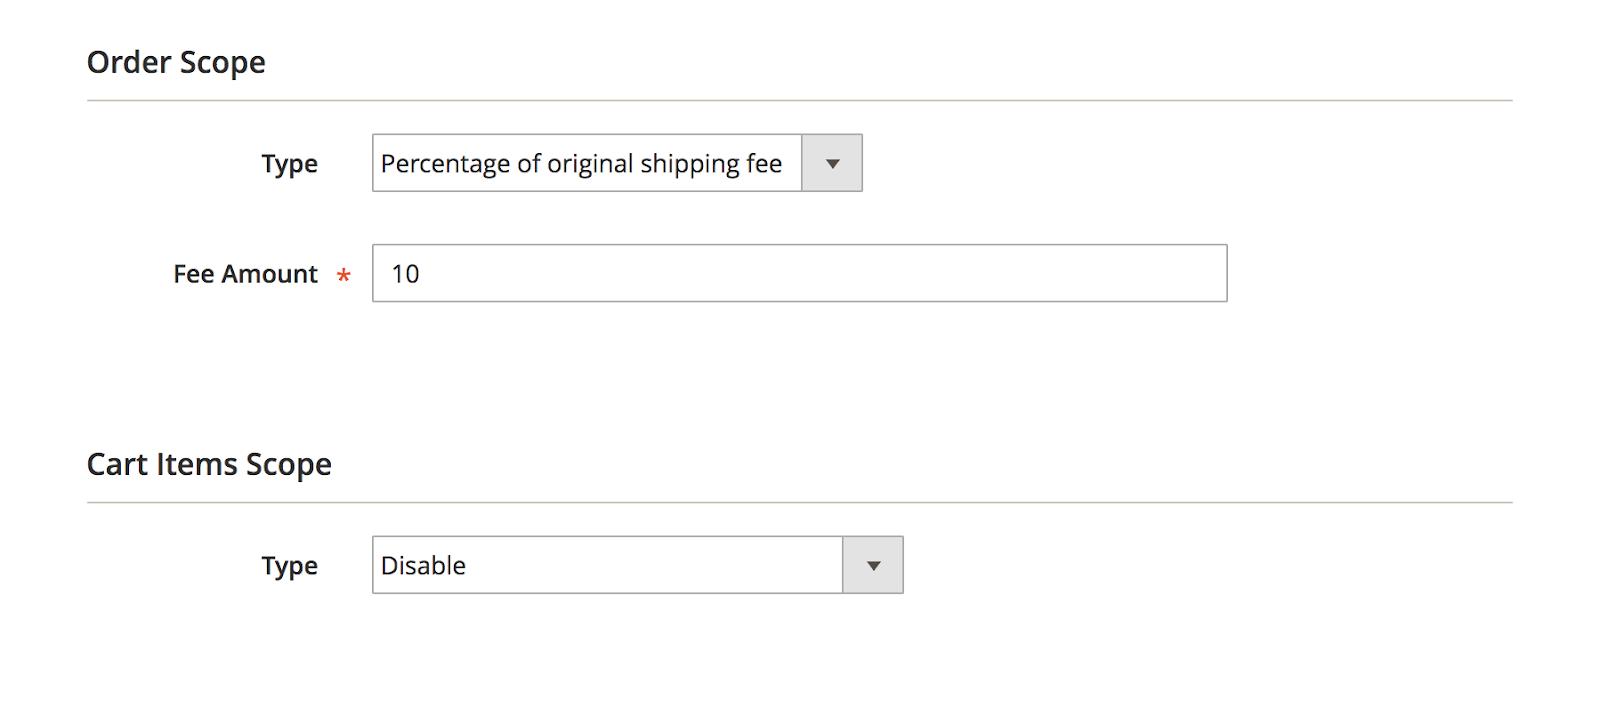 Percentage of original shipping fee